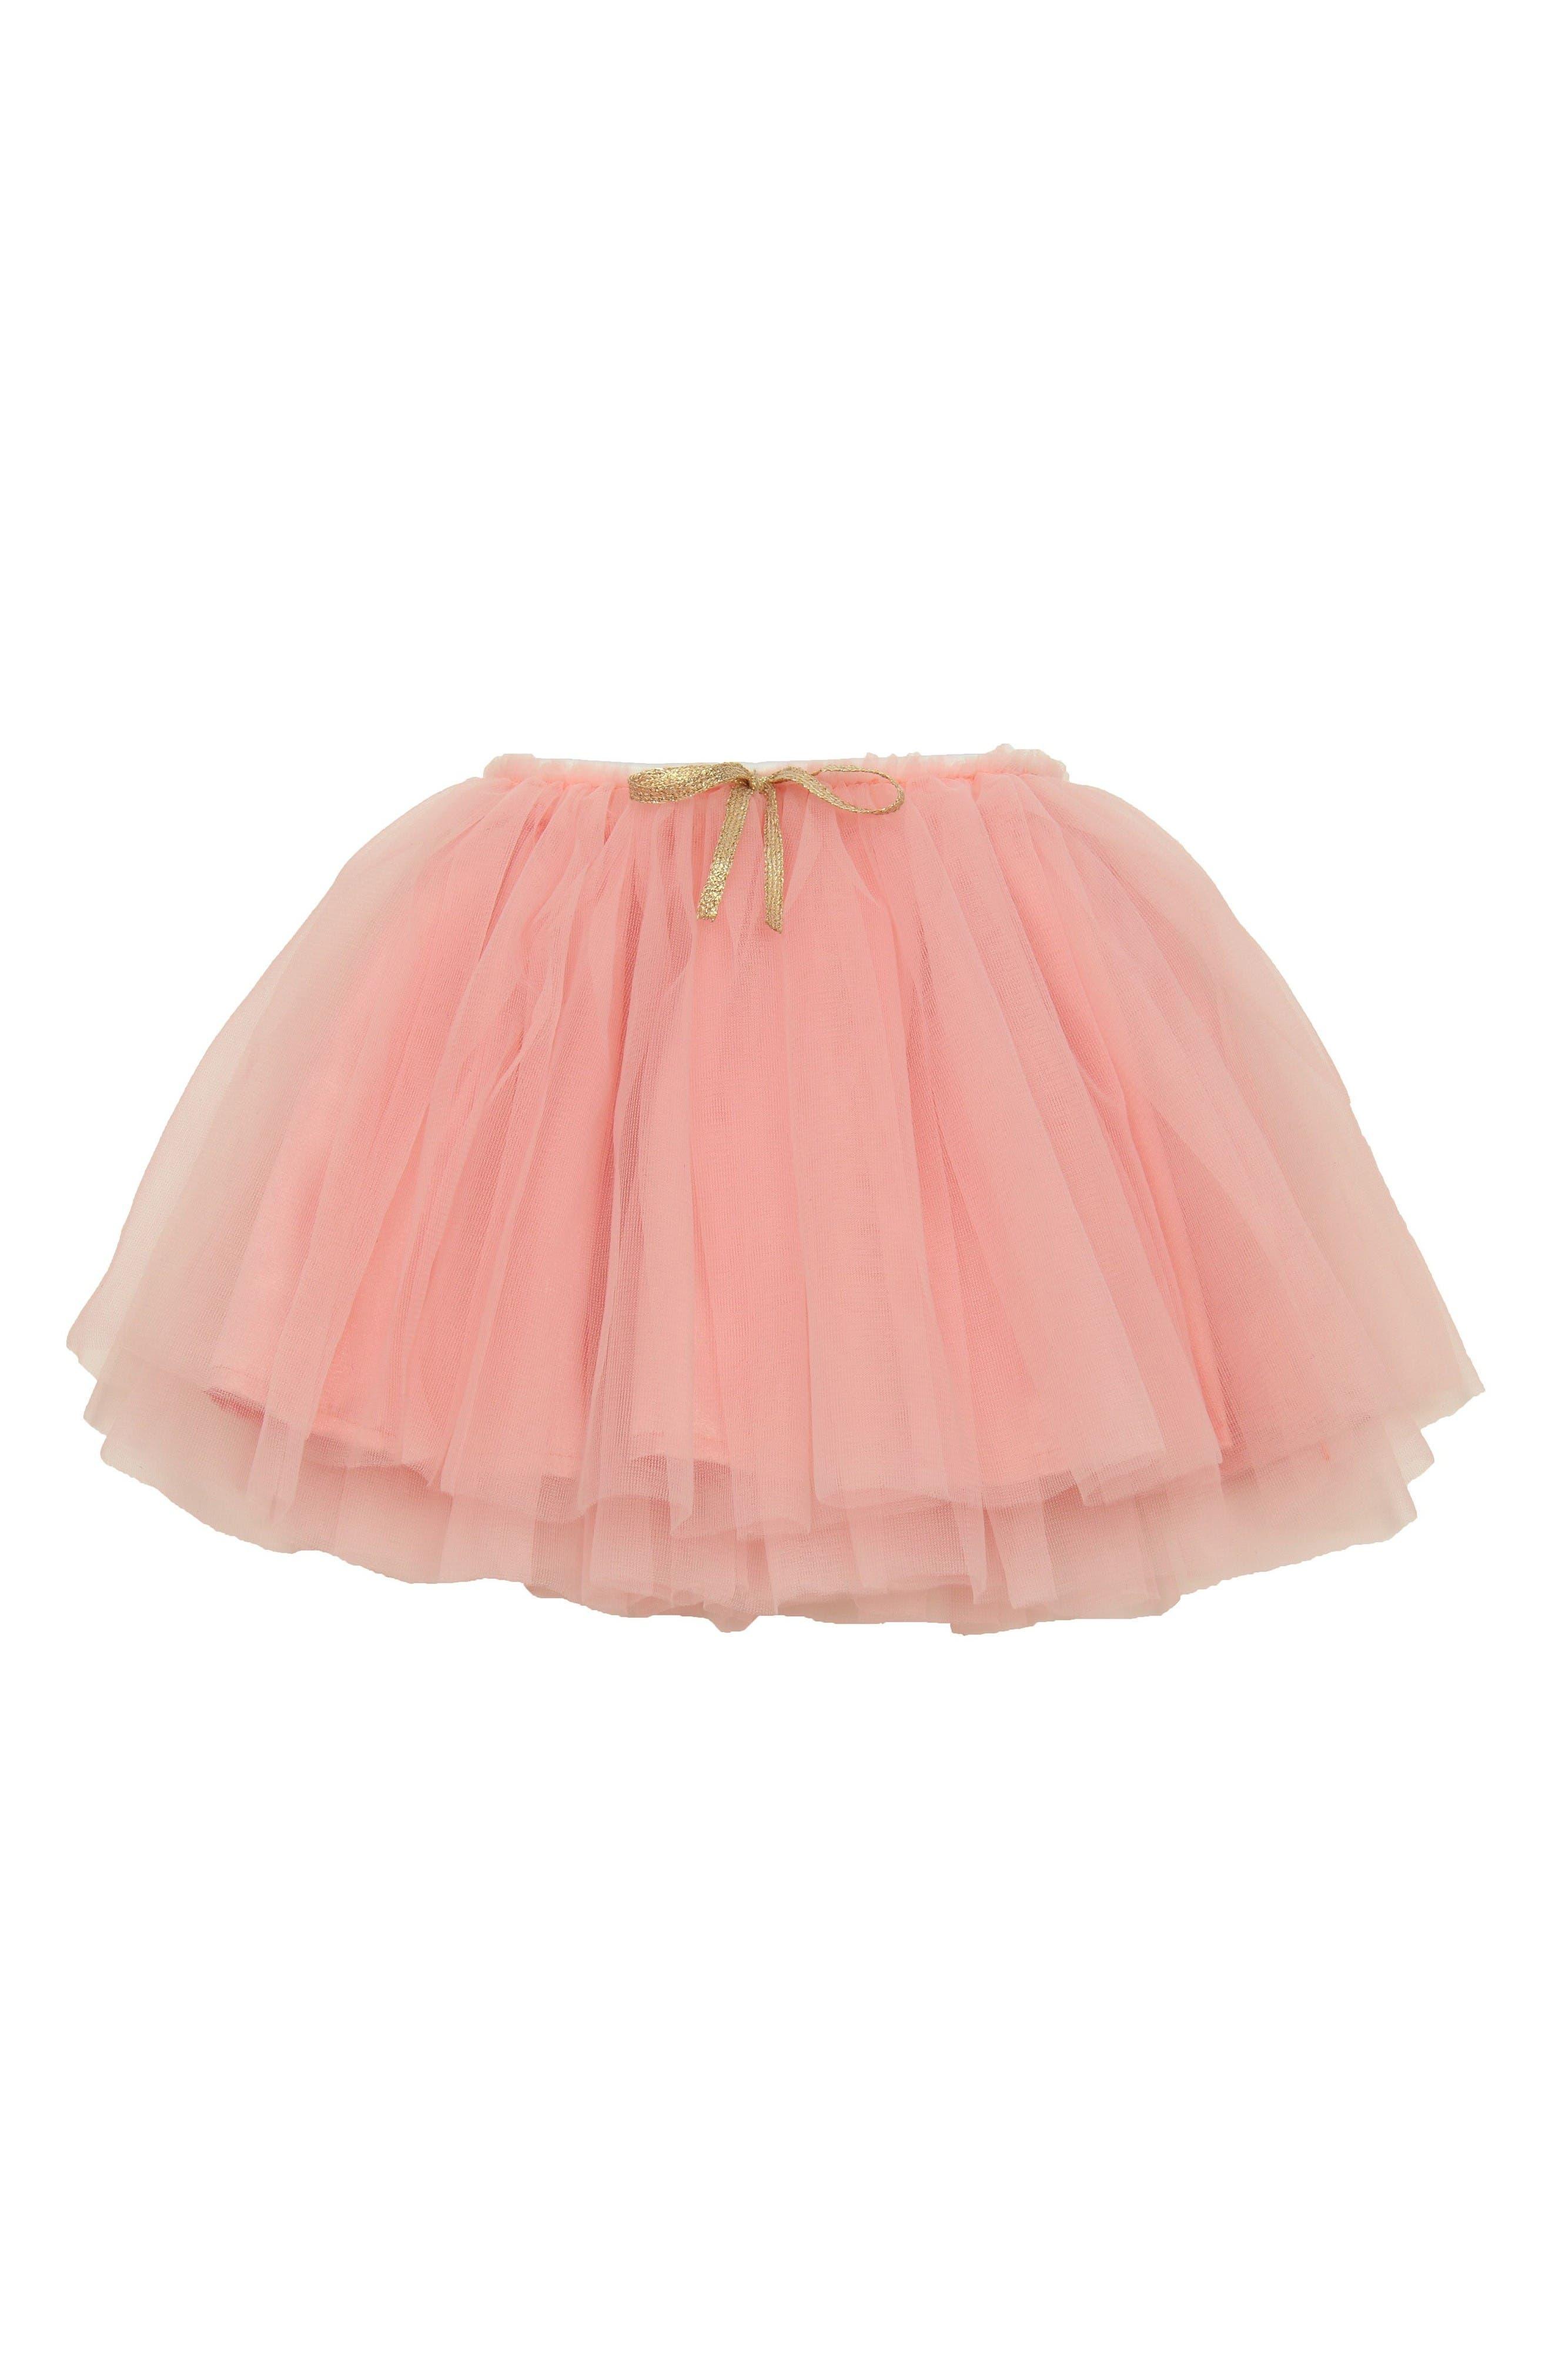 Alternate Image 1 Selected - Popatu Tutu Skirt (Baby Girls)